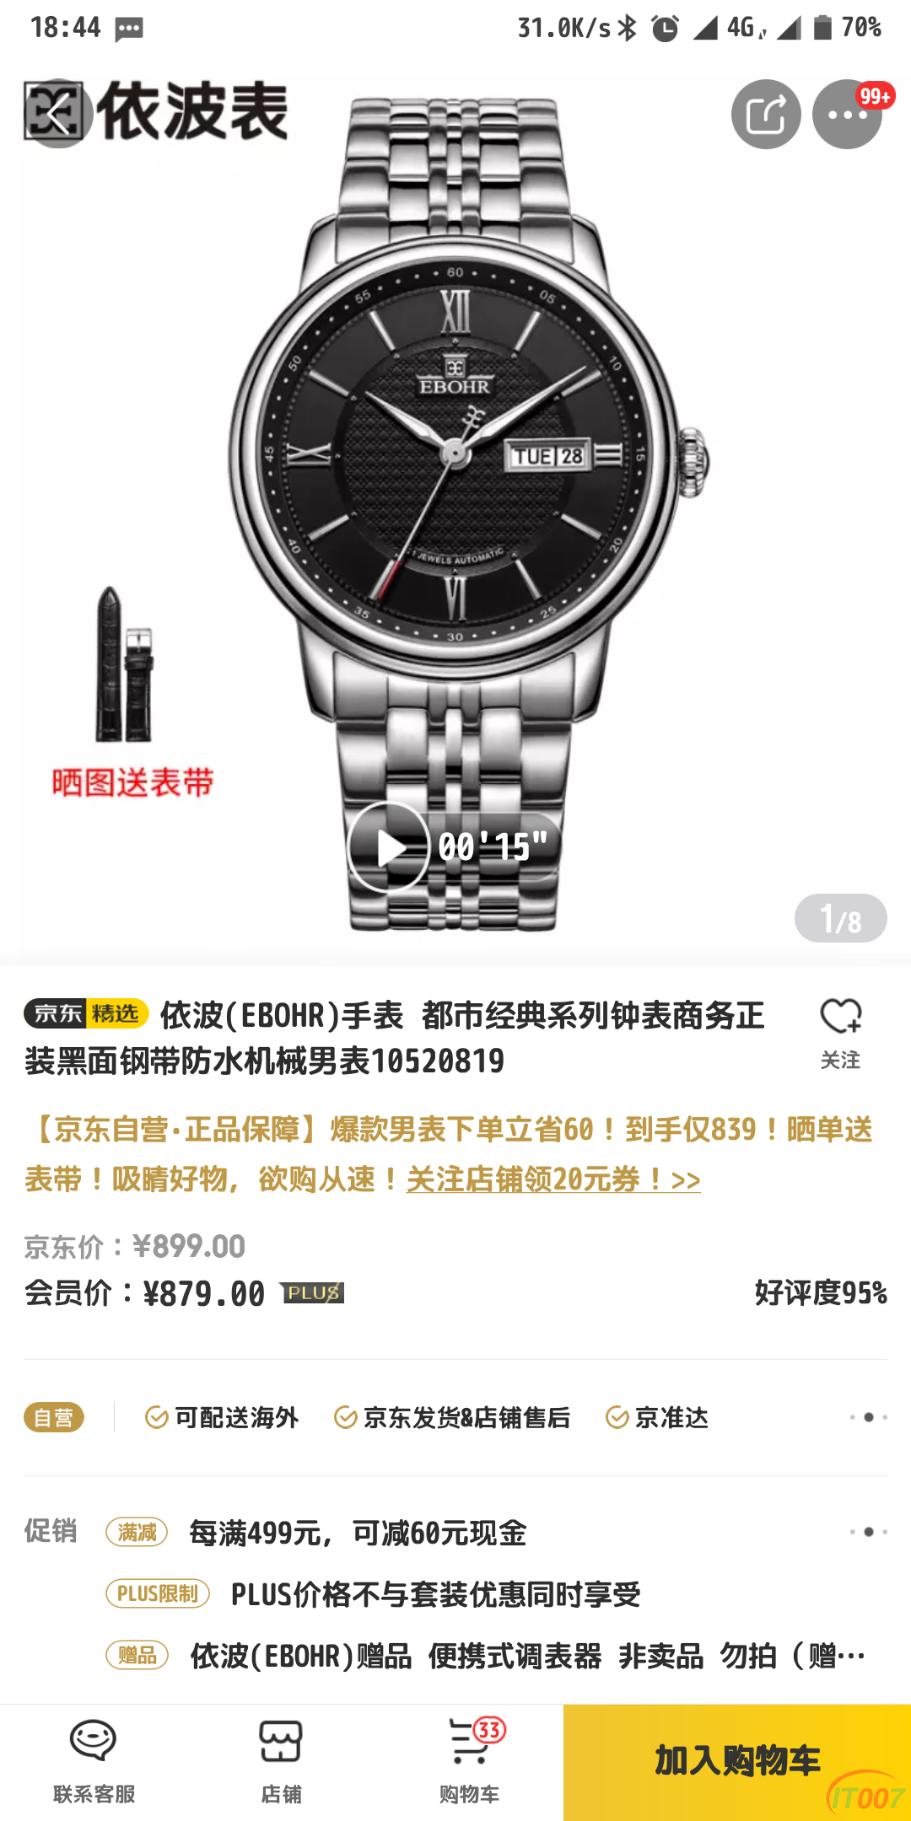 Screenshot_2018-12-06-18-44-42-595_com.jingdong.app.mall.png